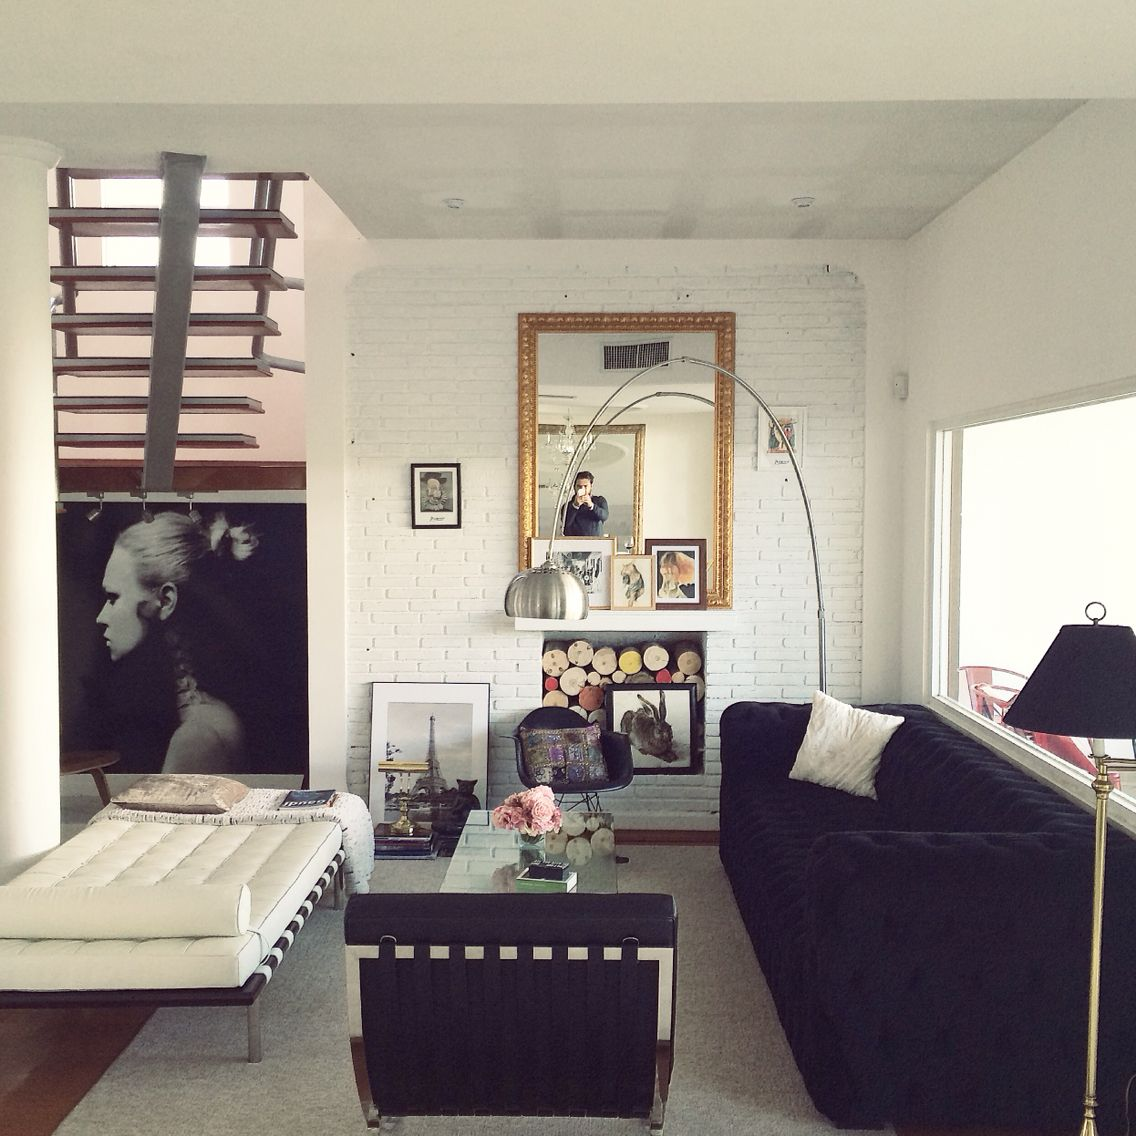 Grey Bedroom Decor Ideas Bedroom Design Ideas For Apartments Bedroom Decor Examples Gypsum Board Bedroom Ceiling Design: Modern Vintage Decor Living Room Barcelona Chair Barcelona